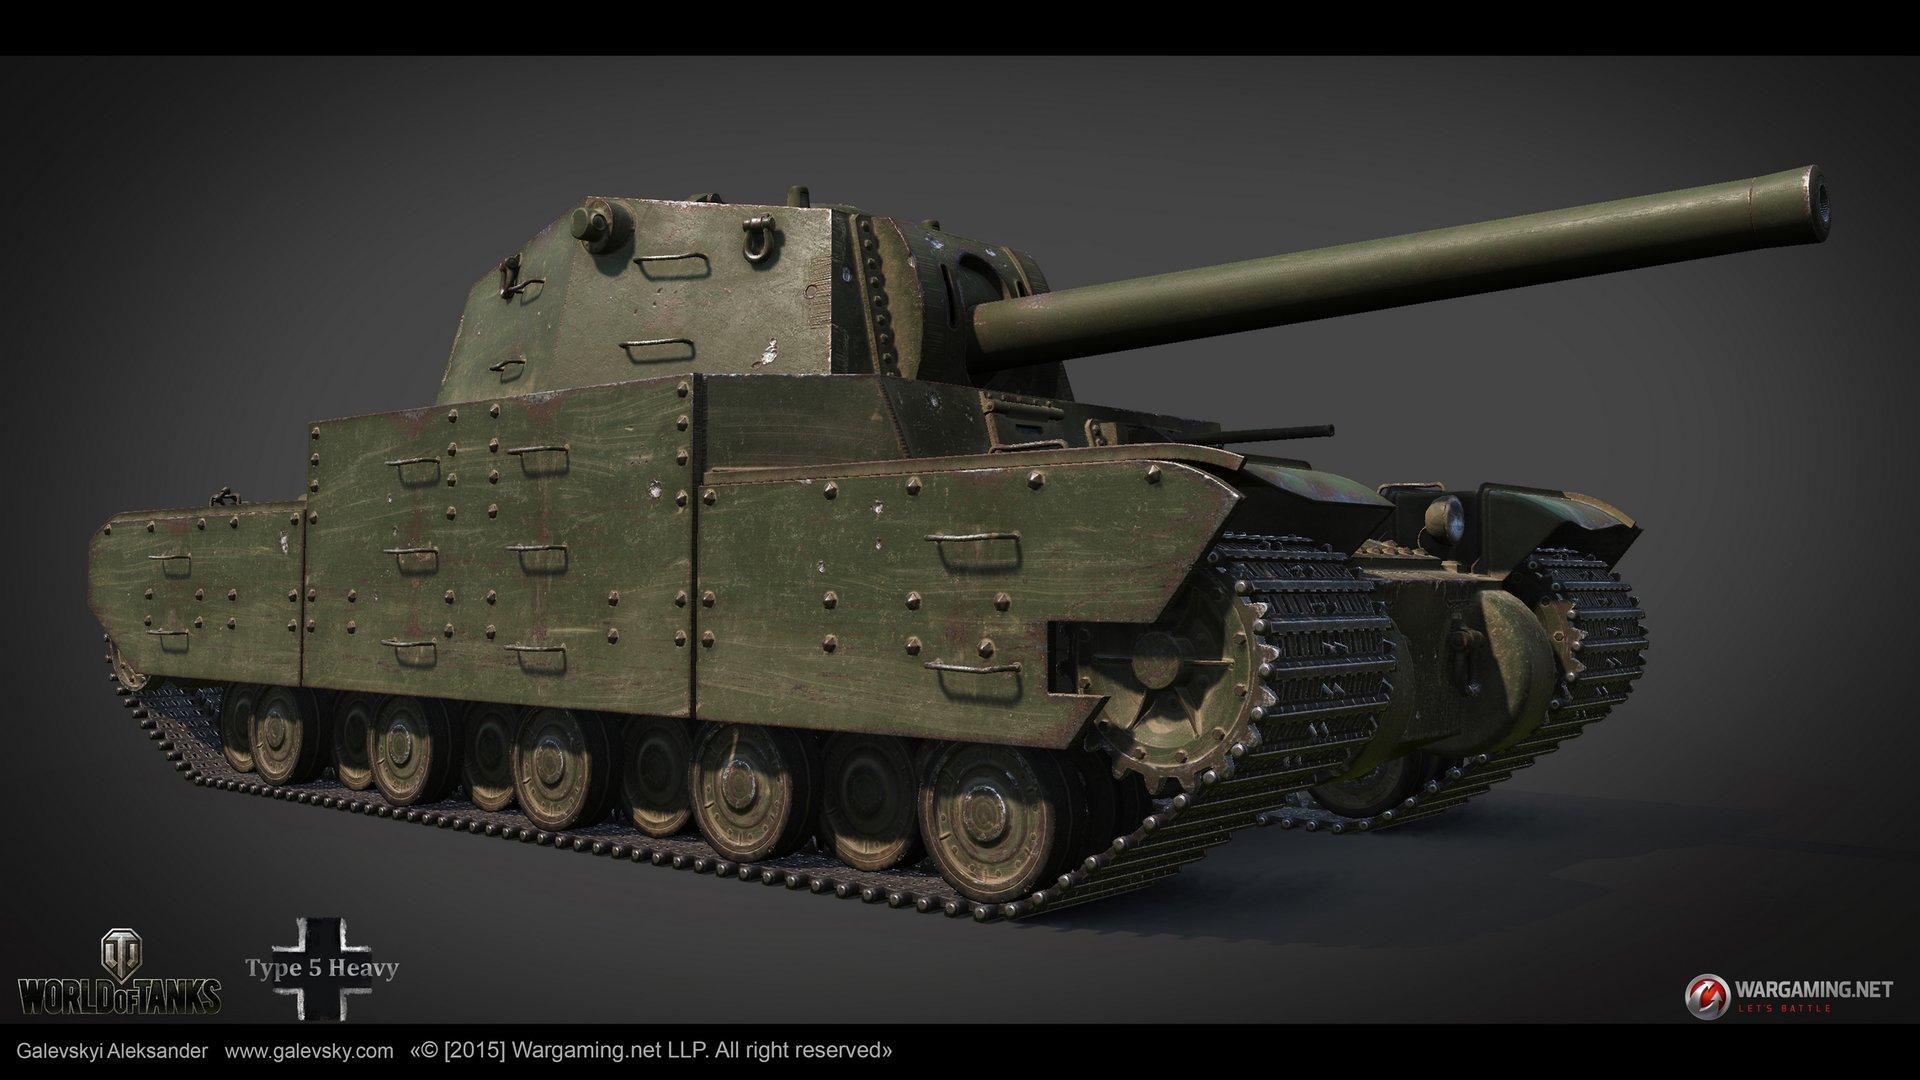 Aleksander galevskyi type 2605 fin 10 med